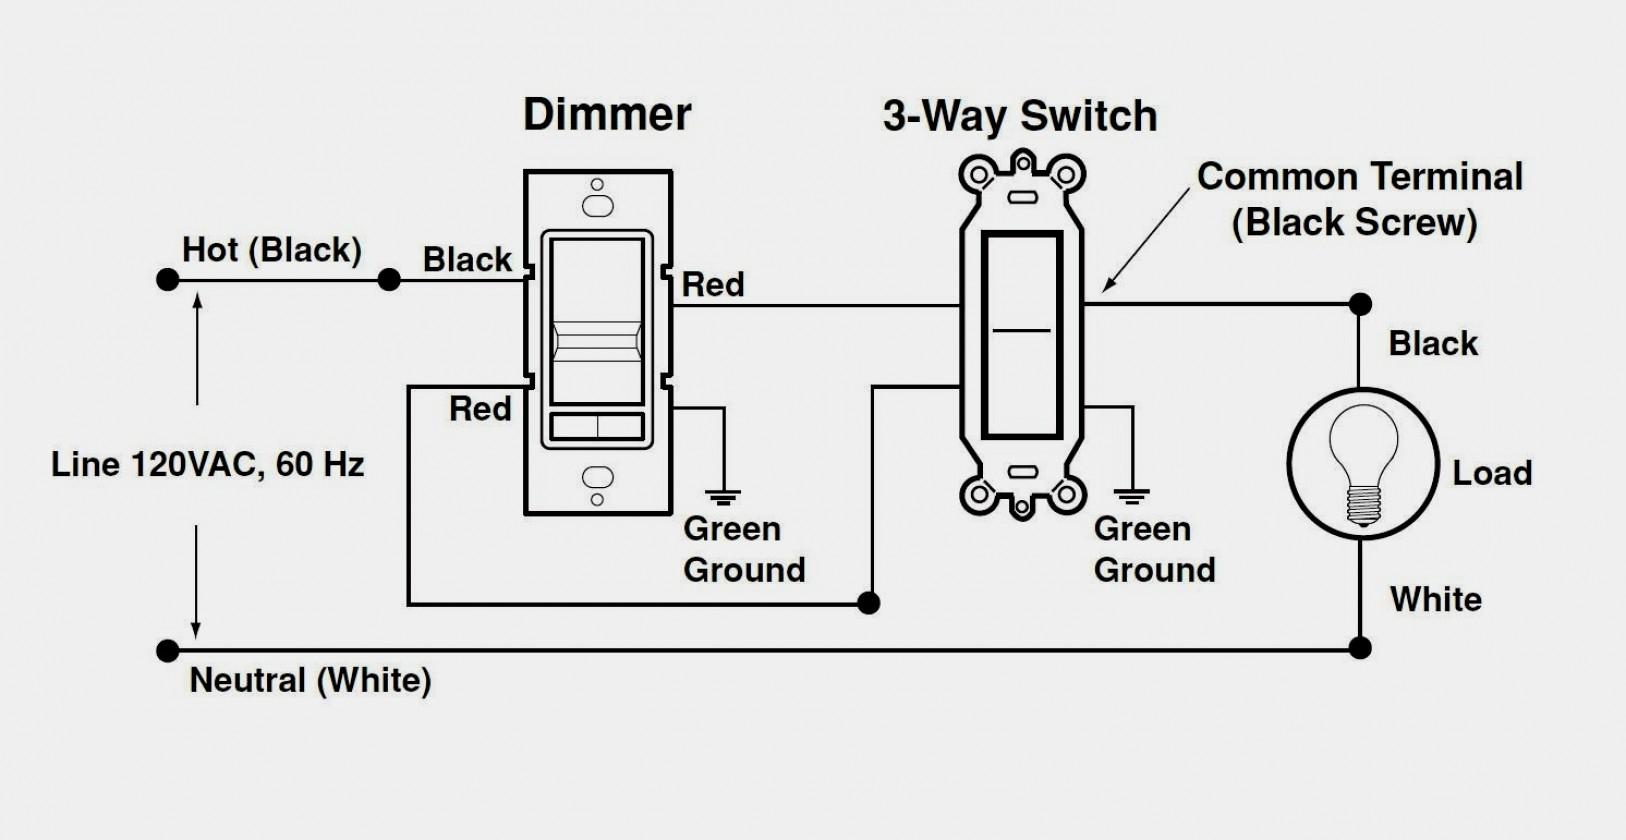 3 Wire Dimmer Switch Diagram   Wiring Diagram - Lutron 3 Way Dimmer Wiring Diagram